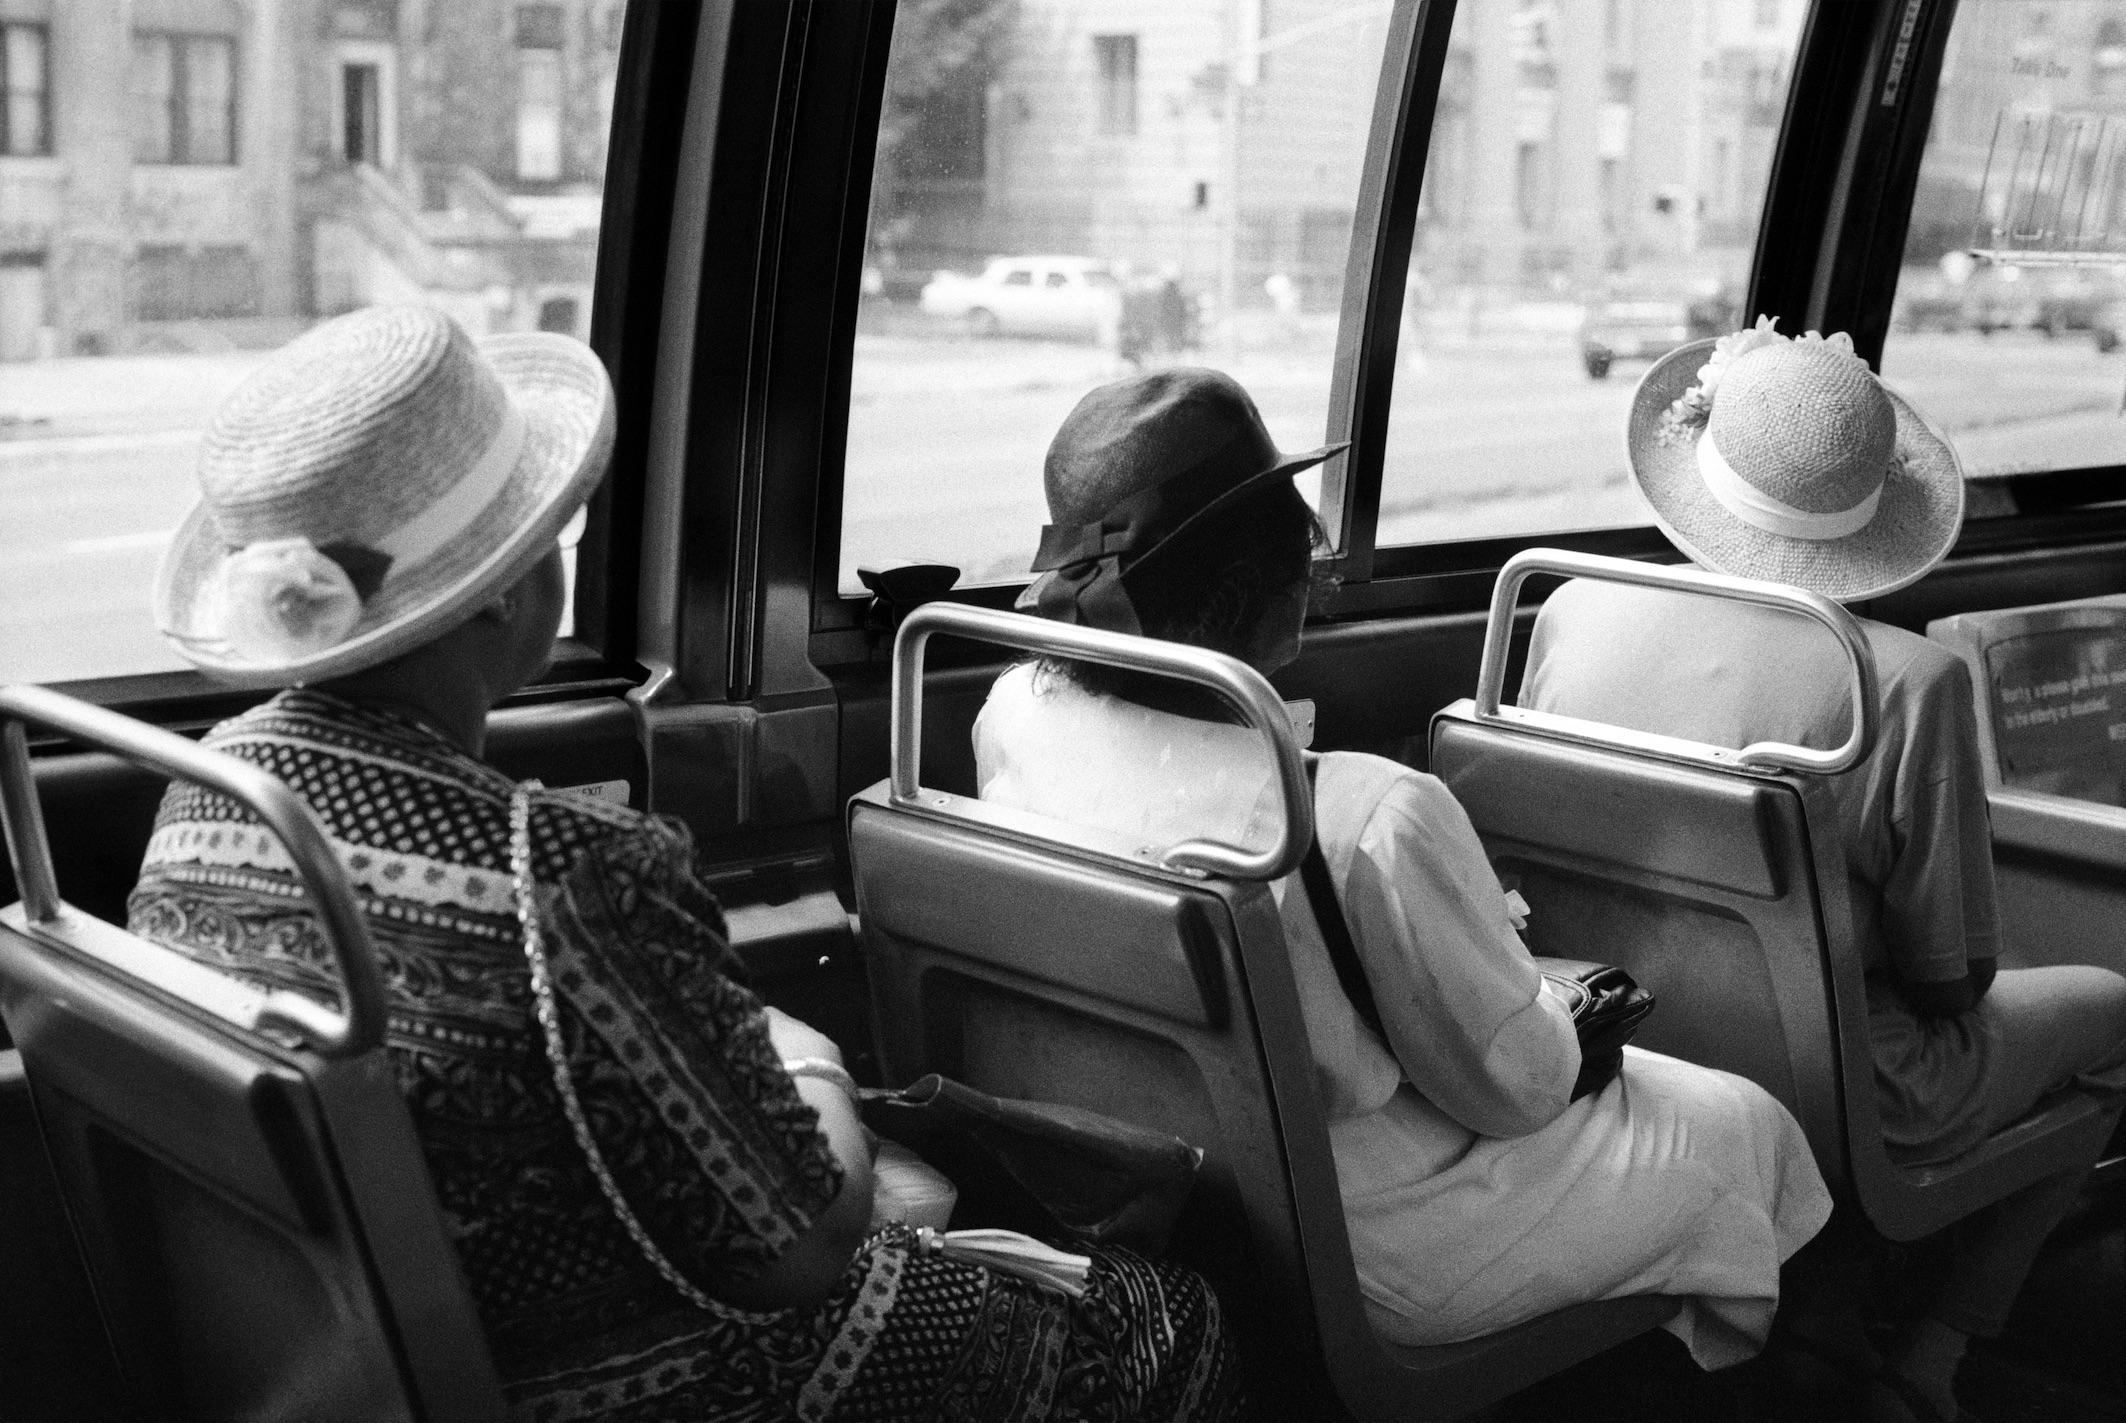 1544019671113-5_Jamel-Shabazz_Church-ladies-Harlem-NYC-1997_copyright-Jamel-Shabazz_courtesy-Galerie-Bene-Taschen